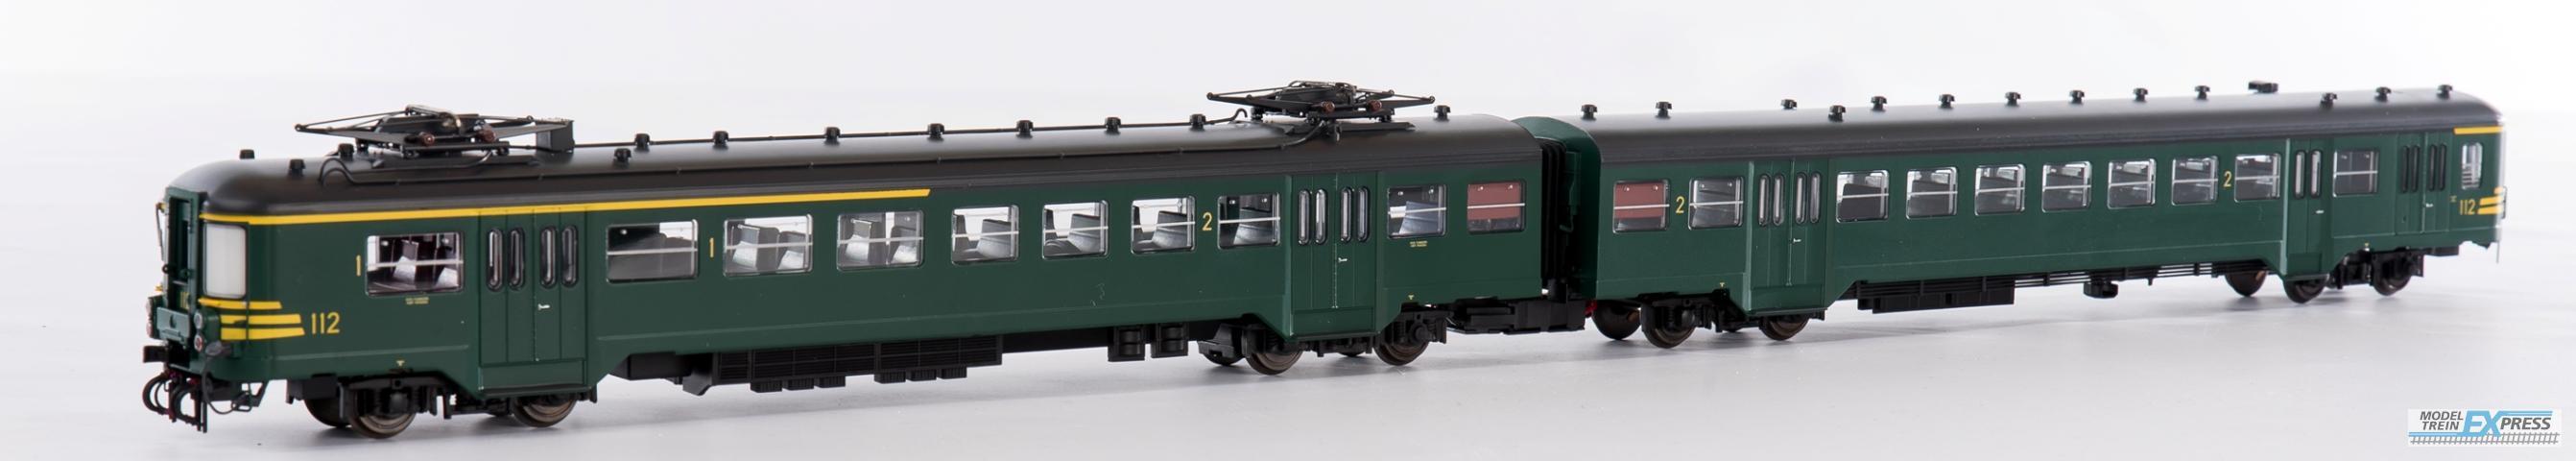 B-Models 7002.03L